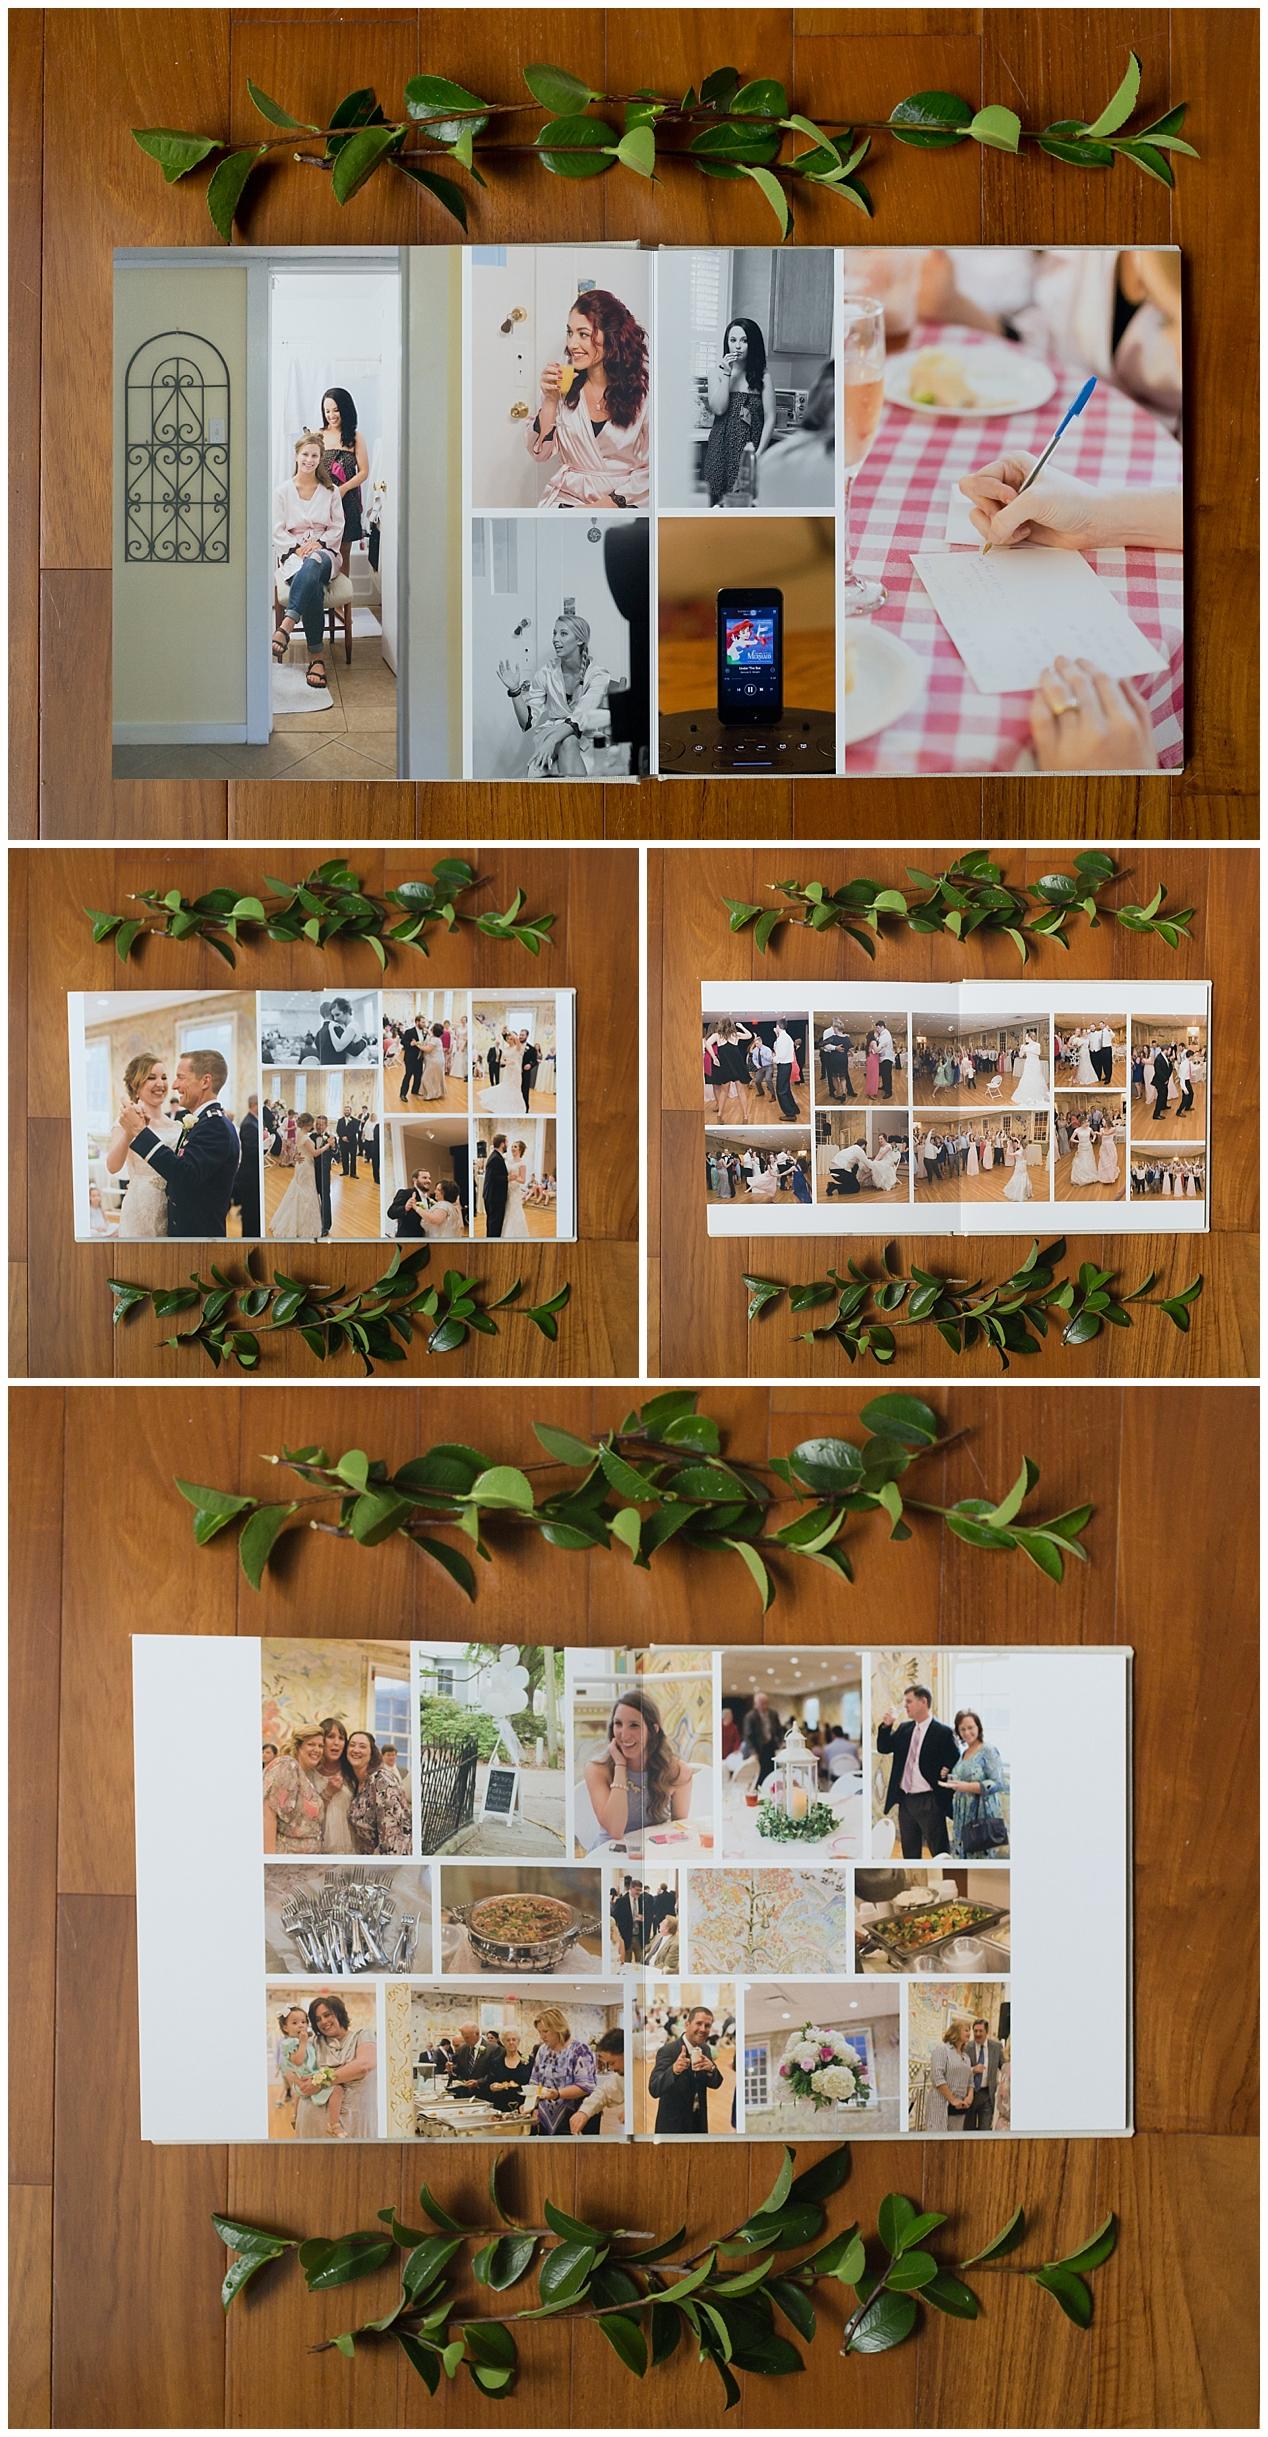 Ocean Springs wedding photography - wedding day album